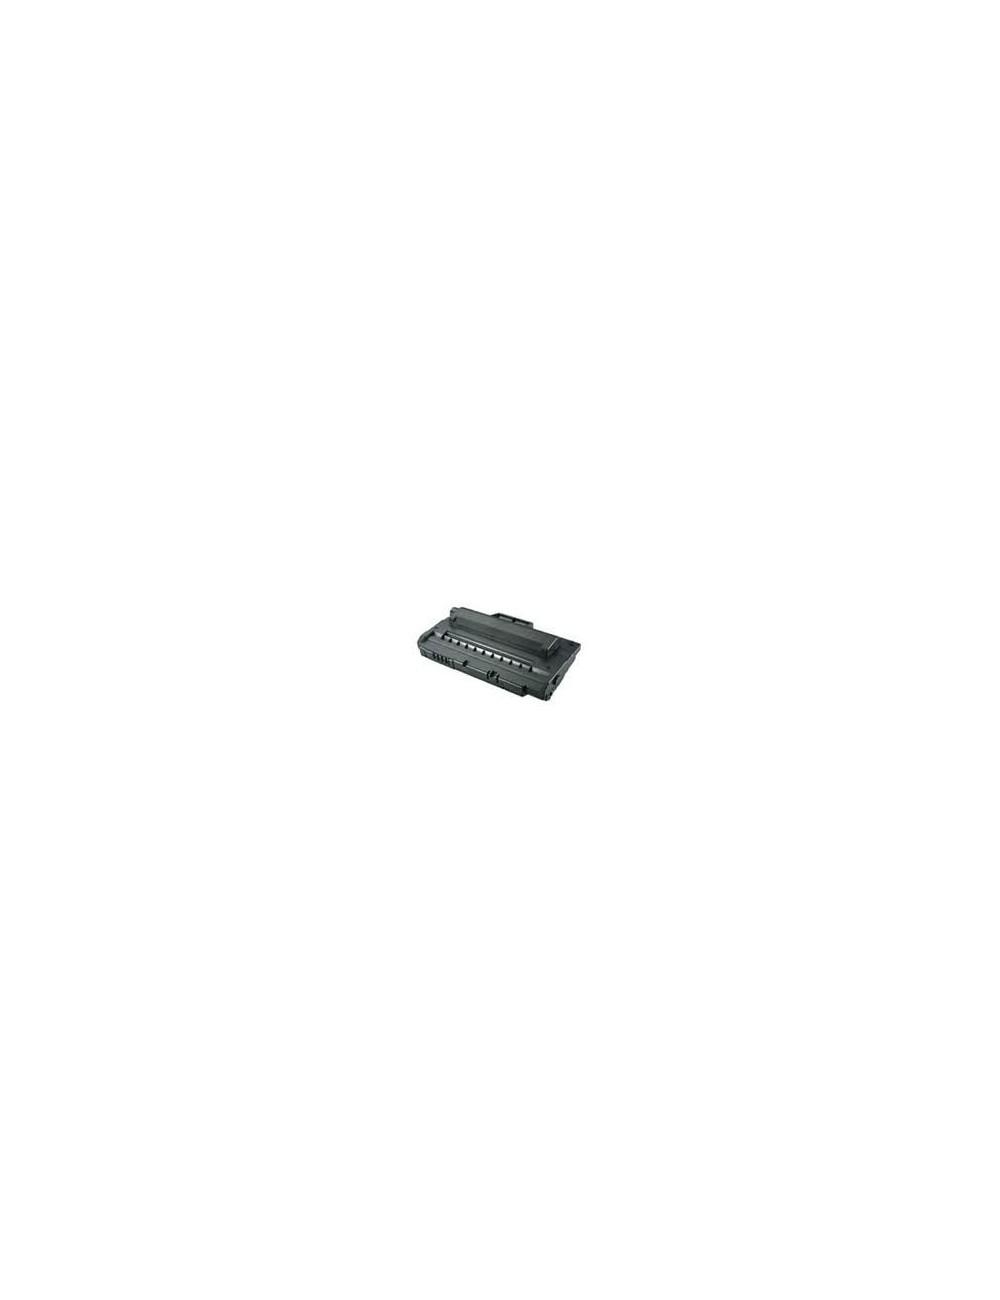 NRG DSM 520 PF / DT520BLK Συμβατό Τόνερ